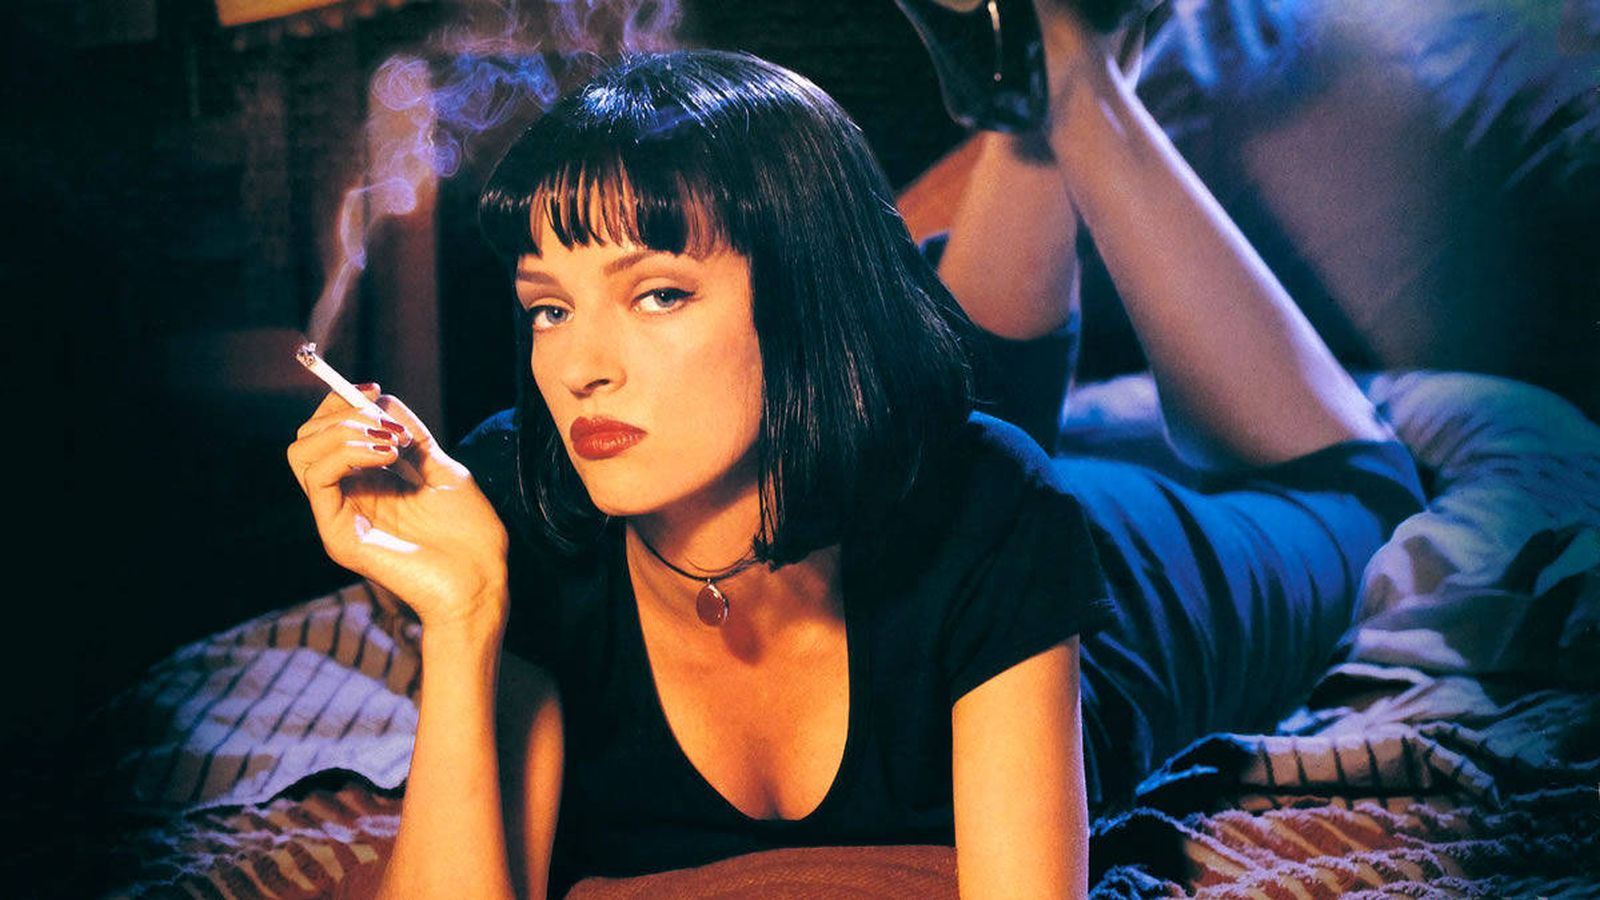 Foto: 'Pulp Fiction' (Quentin Tarantino, 1994)